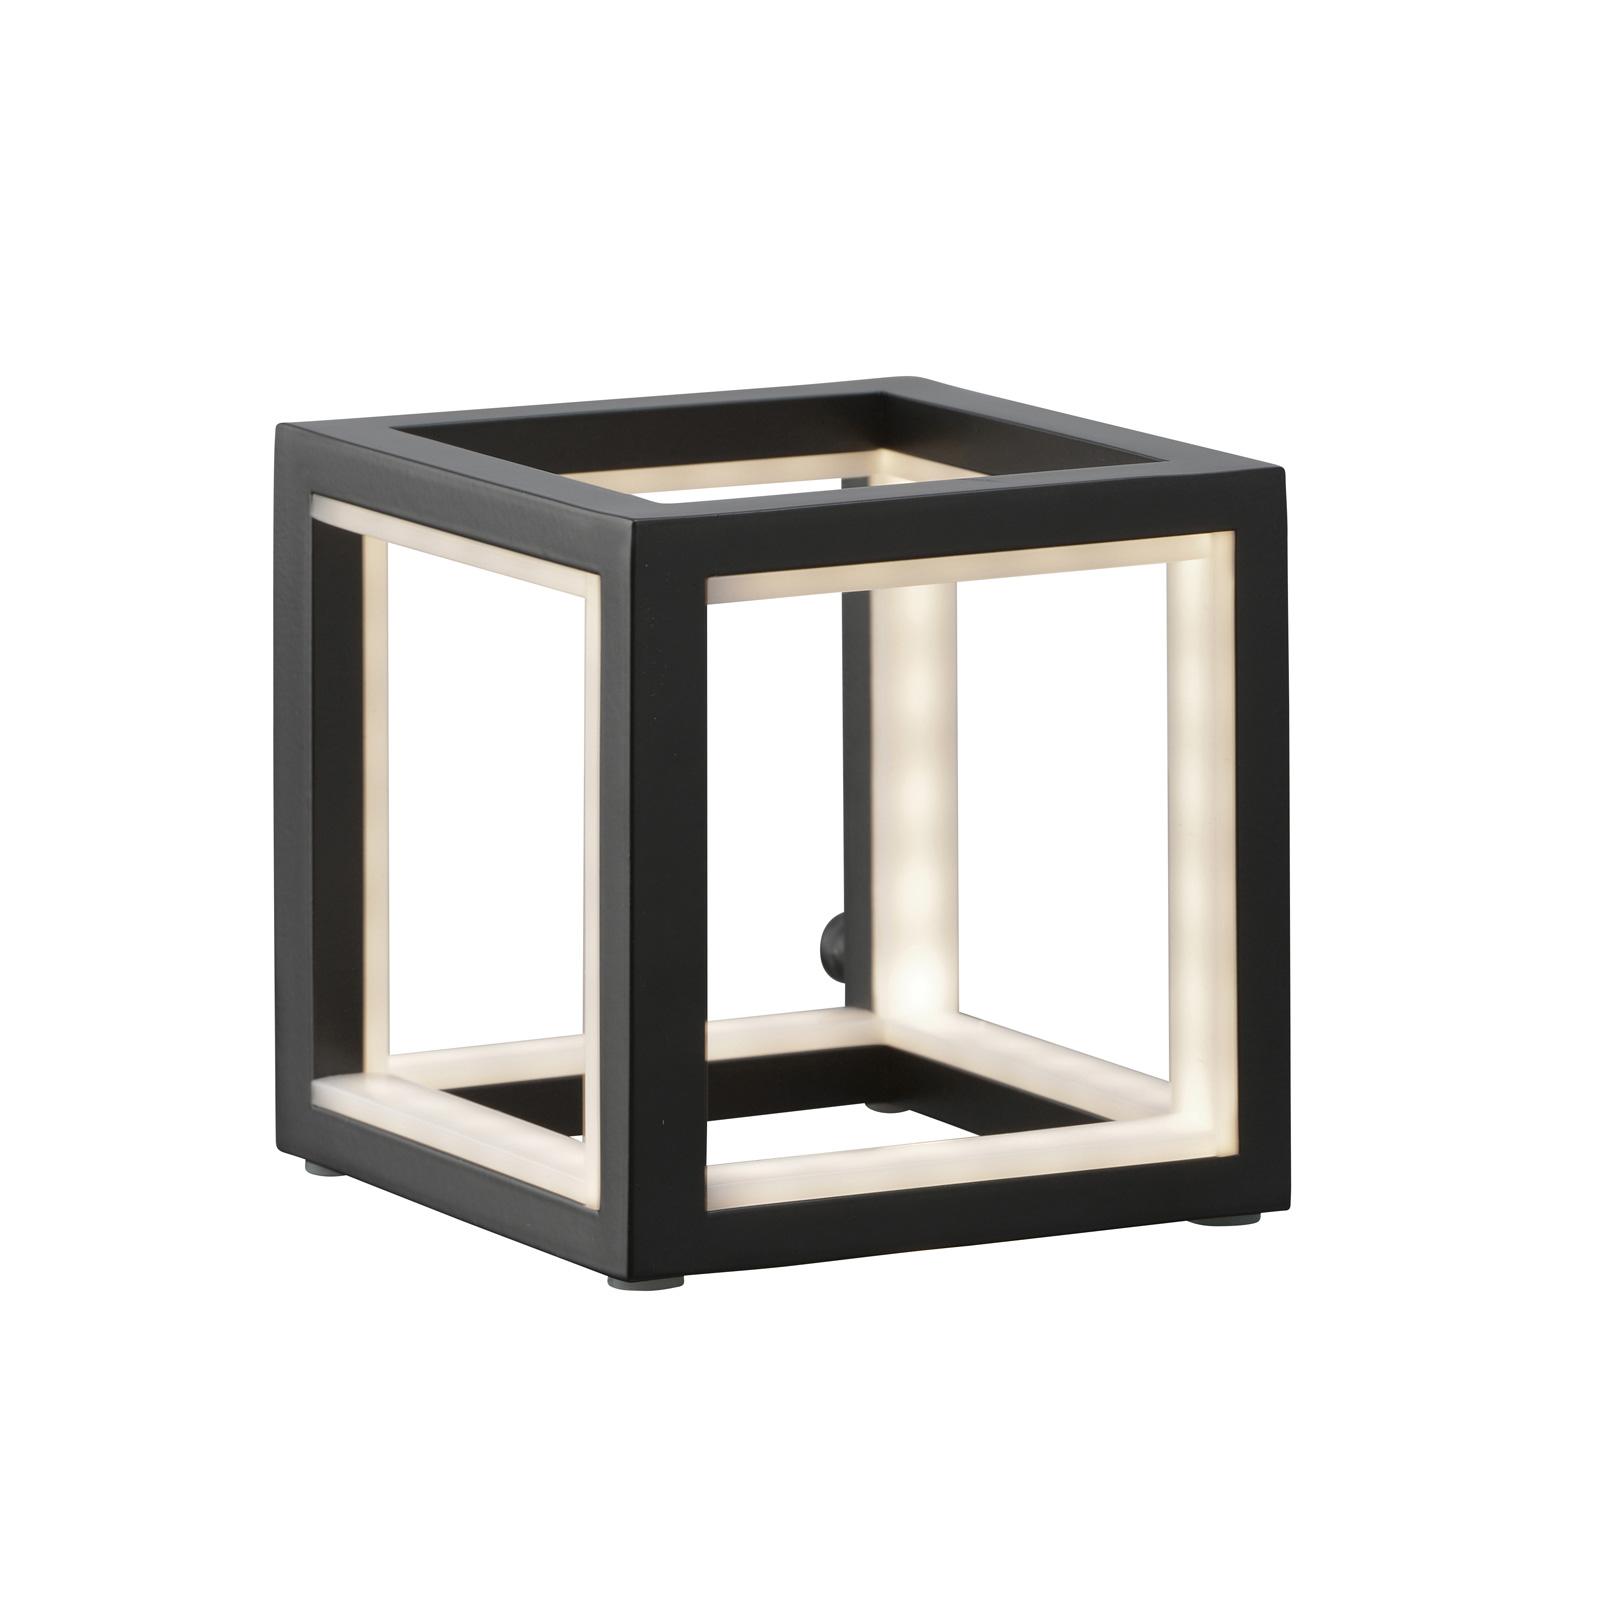 LED-bordlampe Delux, svart, 12 cm